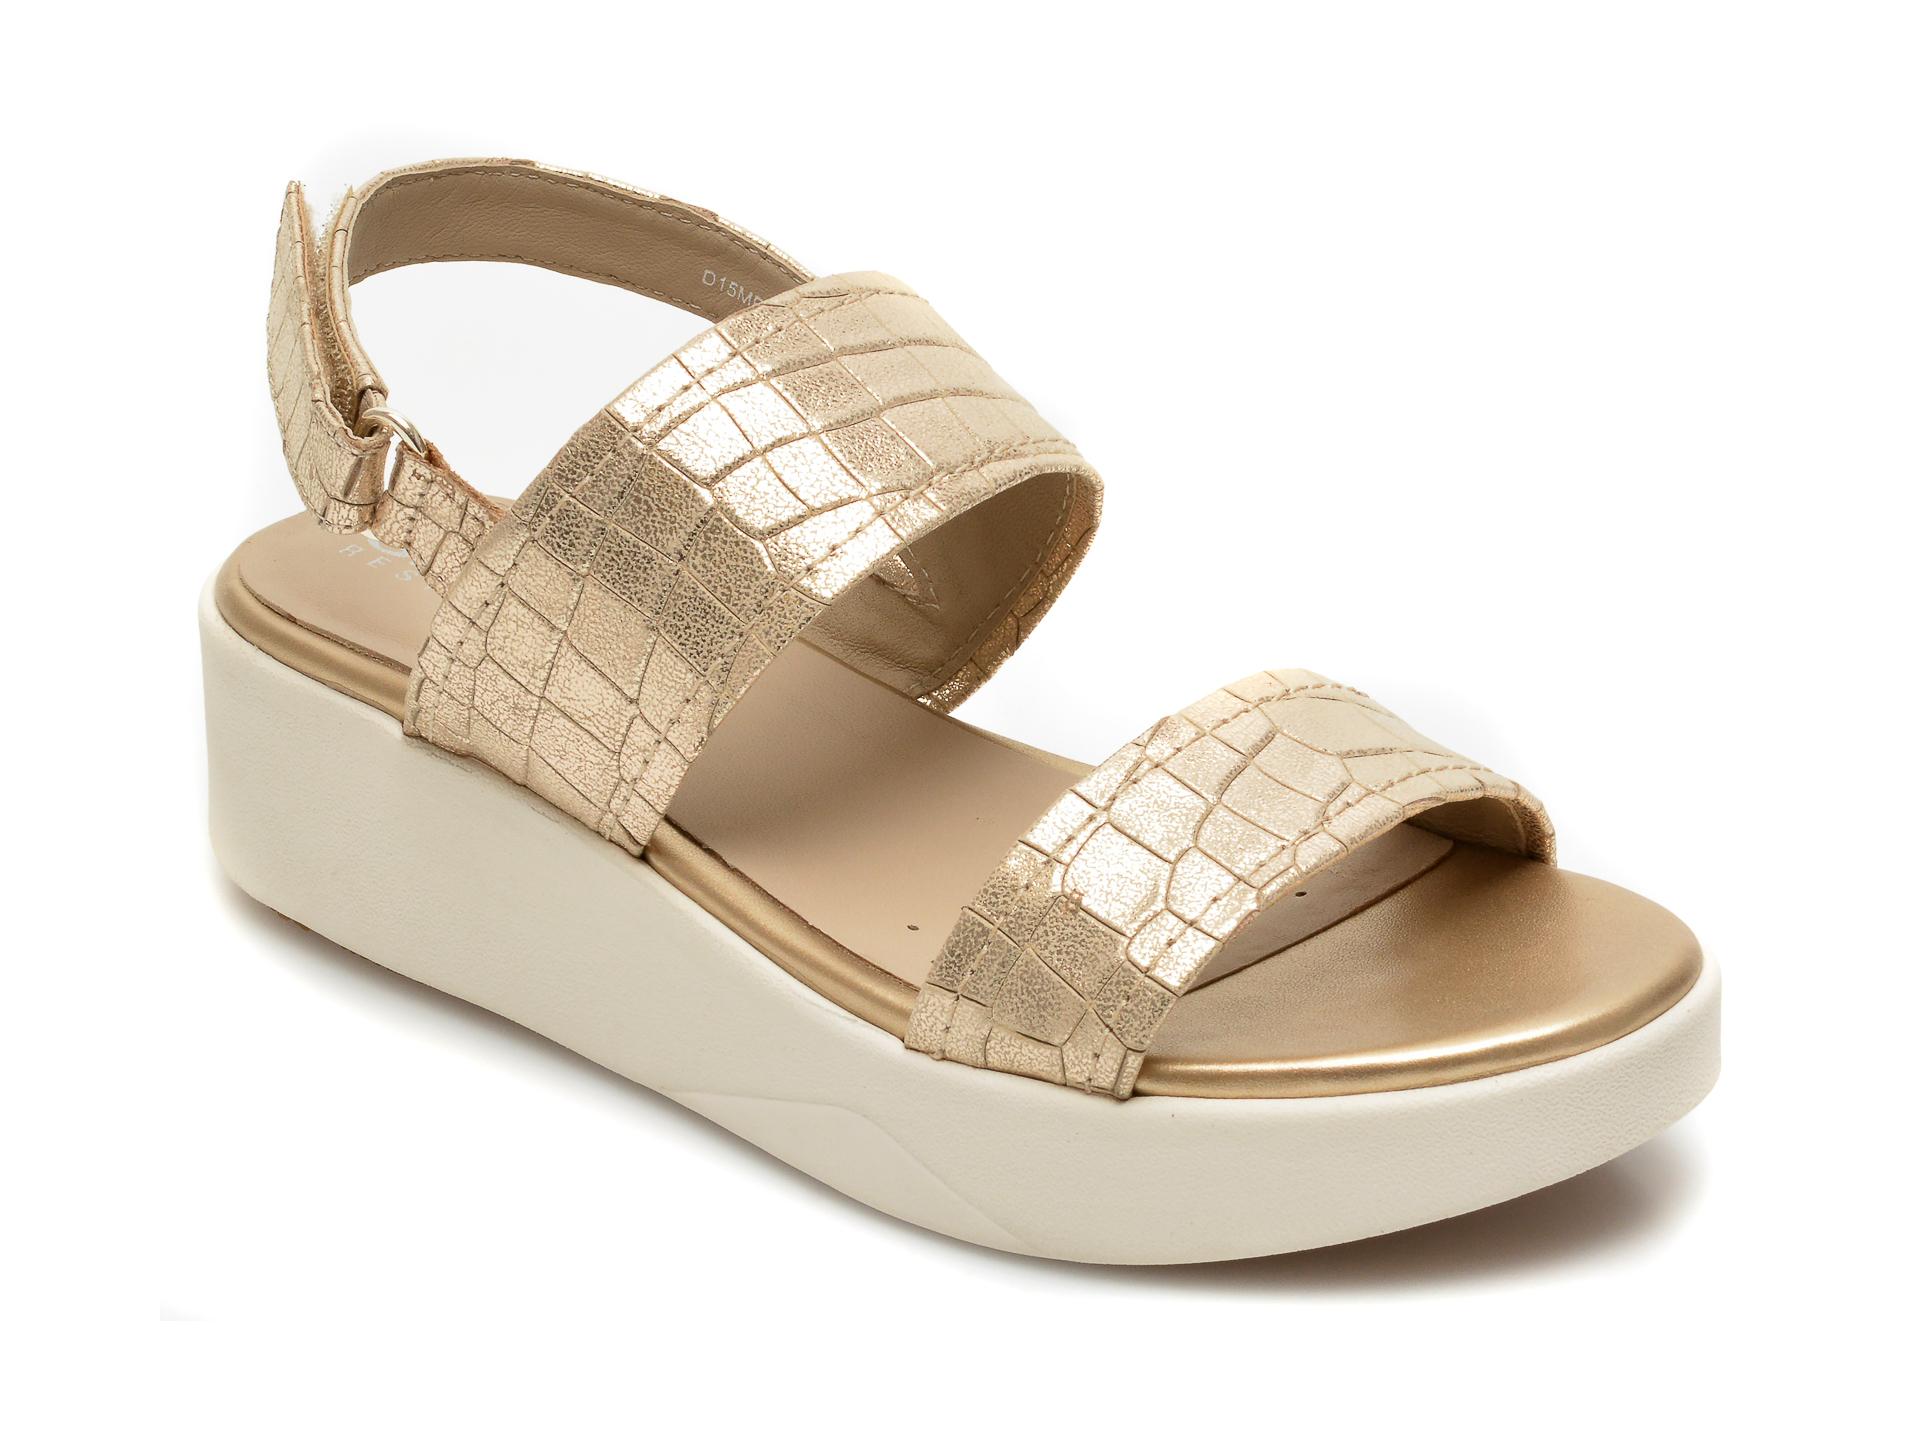 Sandale GEOX aurii, D15MPC, din piele naturala imagine otter.ro